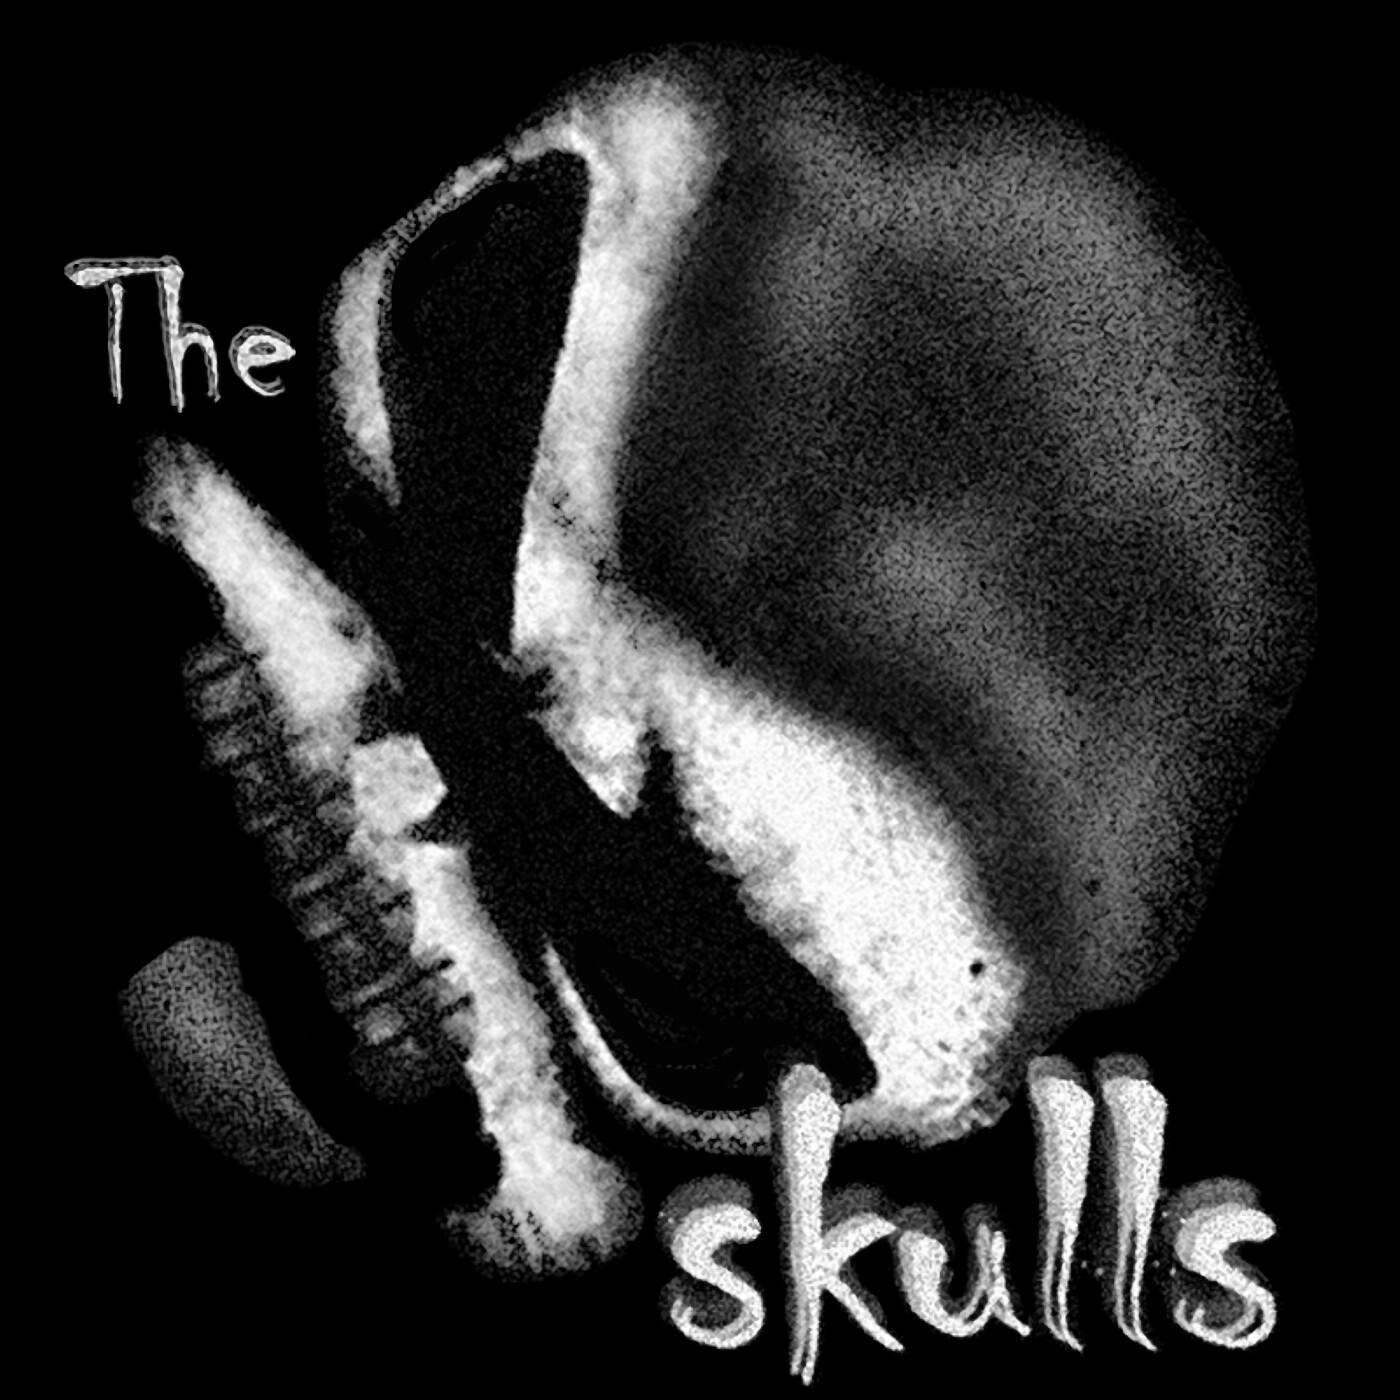 The 13 Skulls....